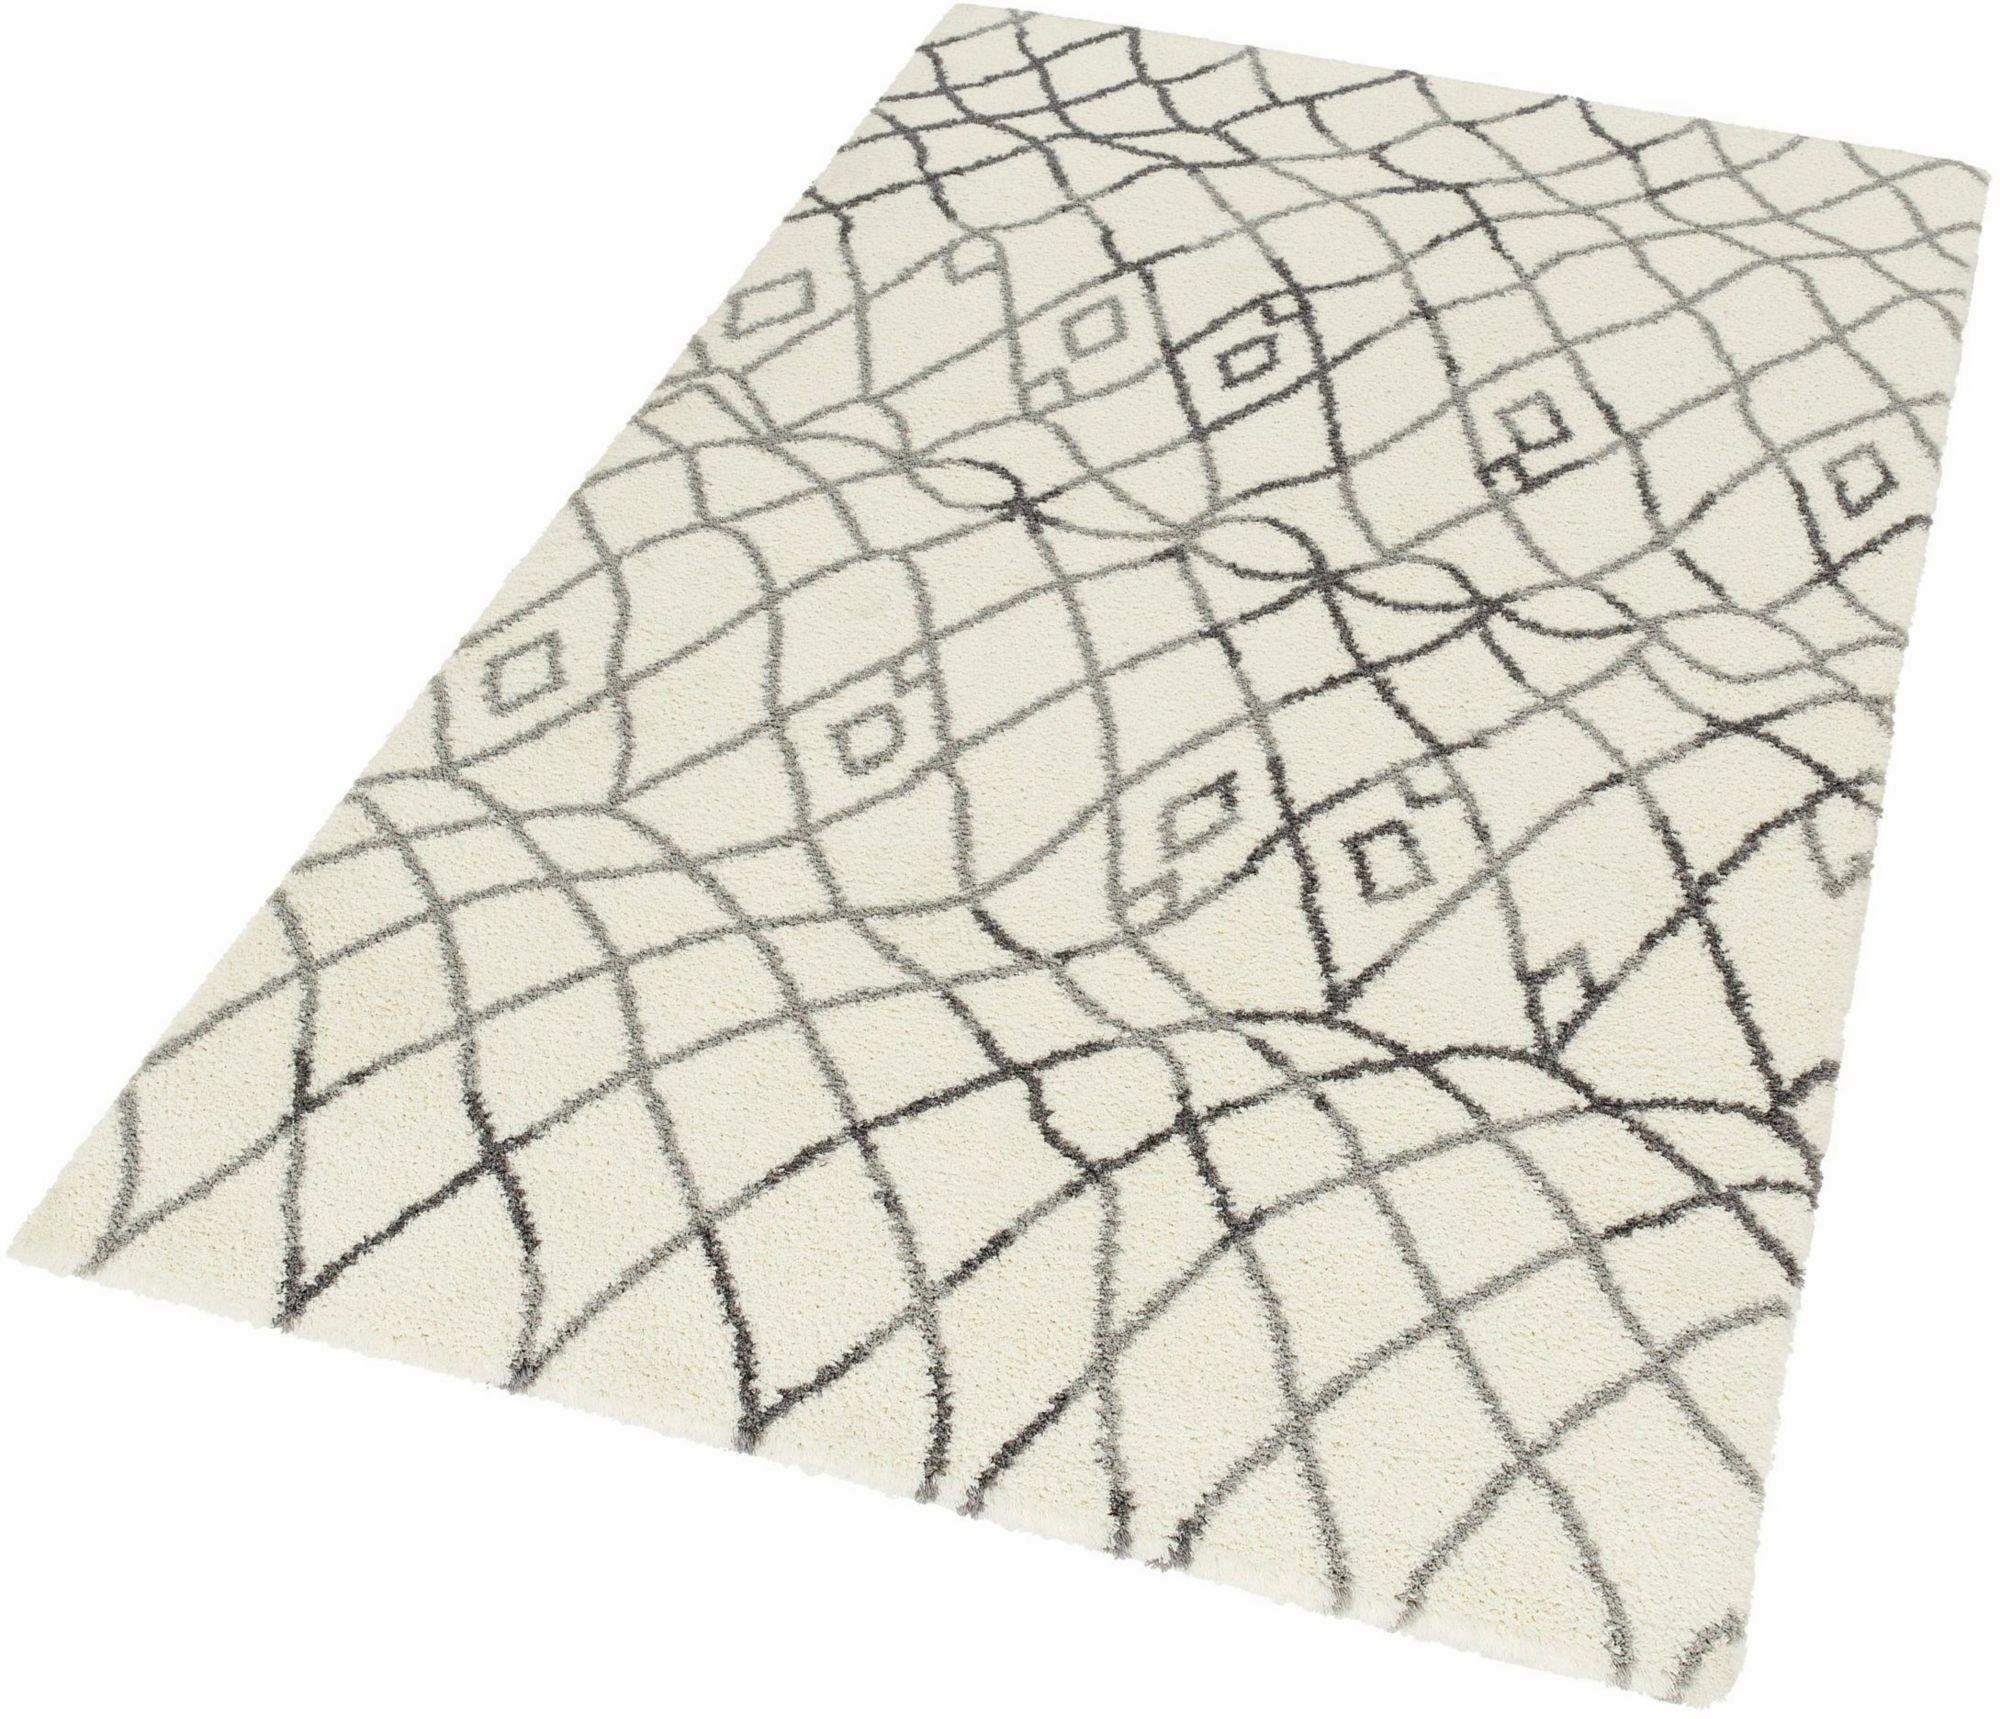 ASTRA Hochflor-Teppich, Astra, »Rivoli 171«, Höhe 30 mm, gewebt